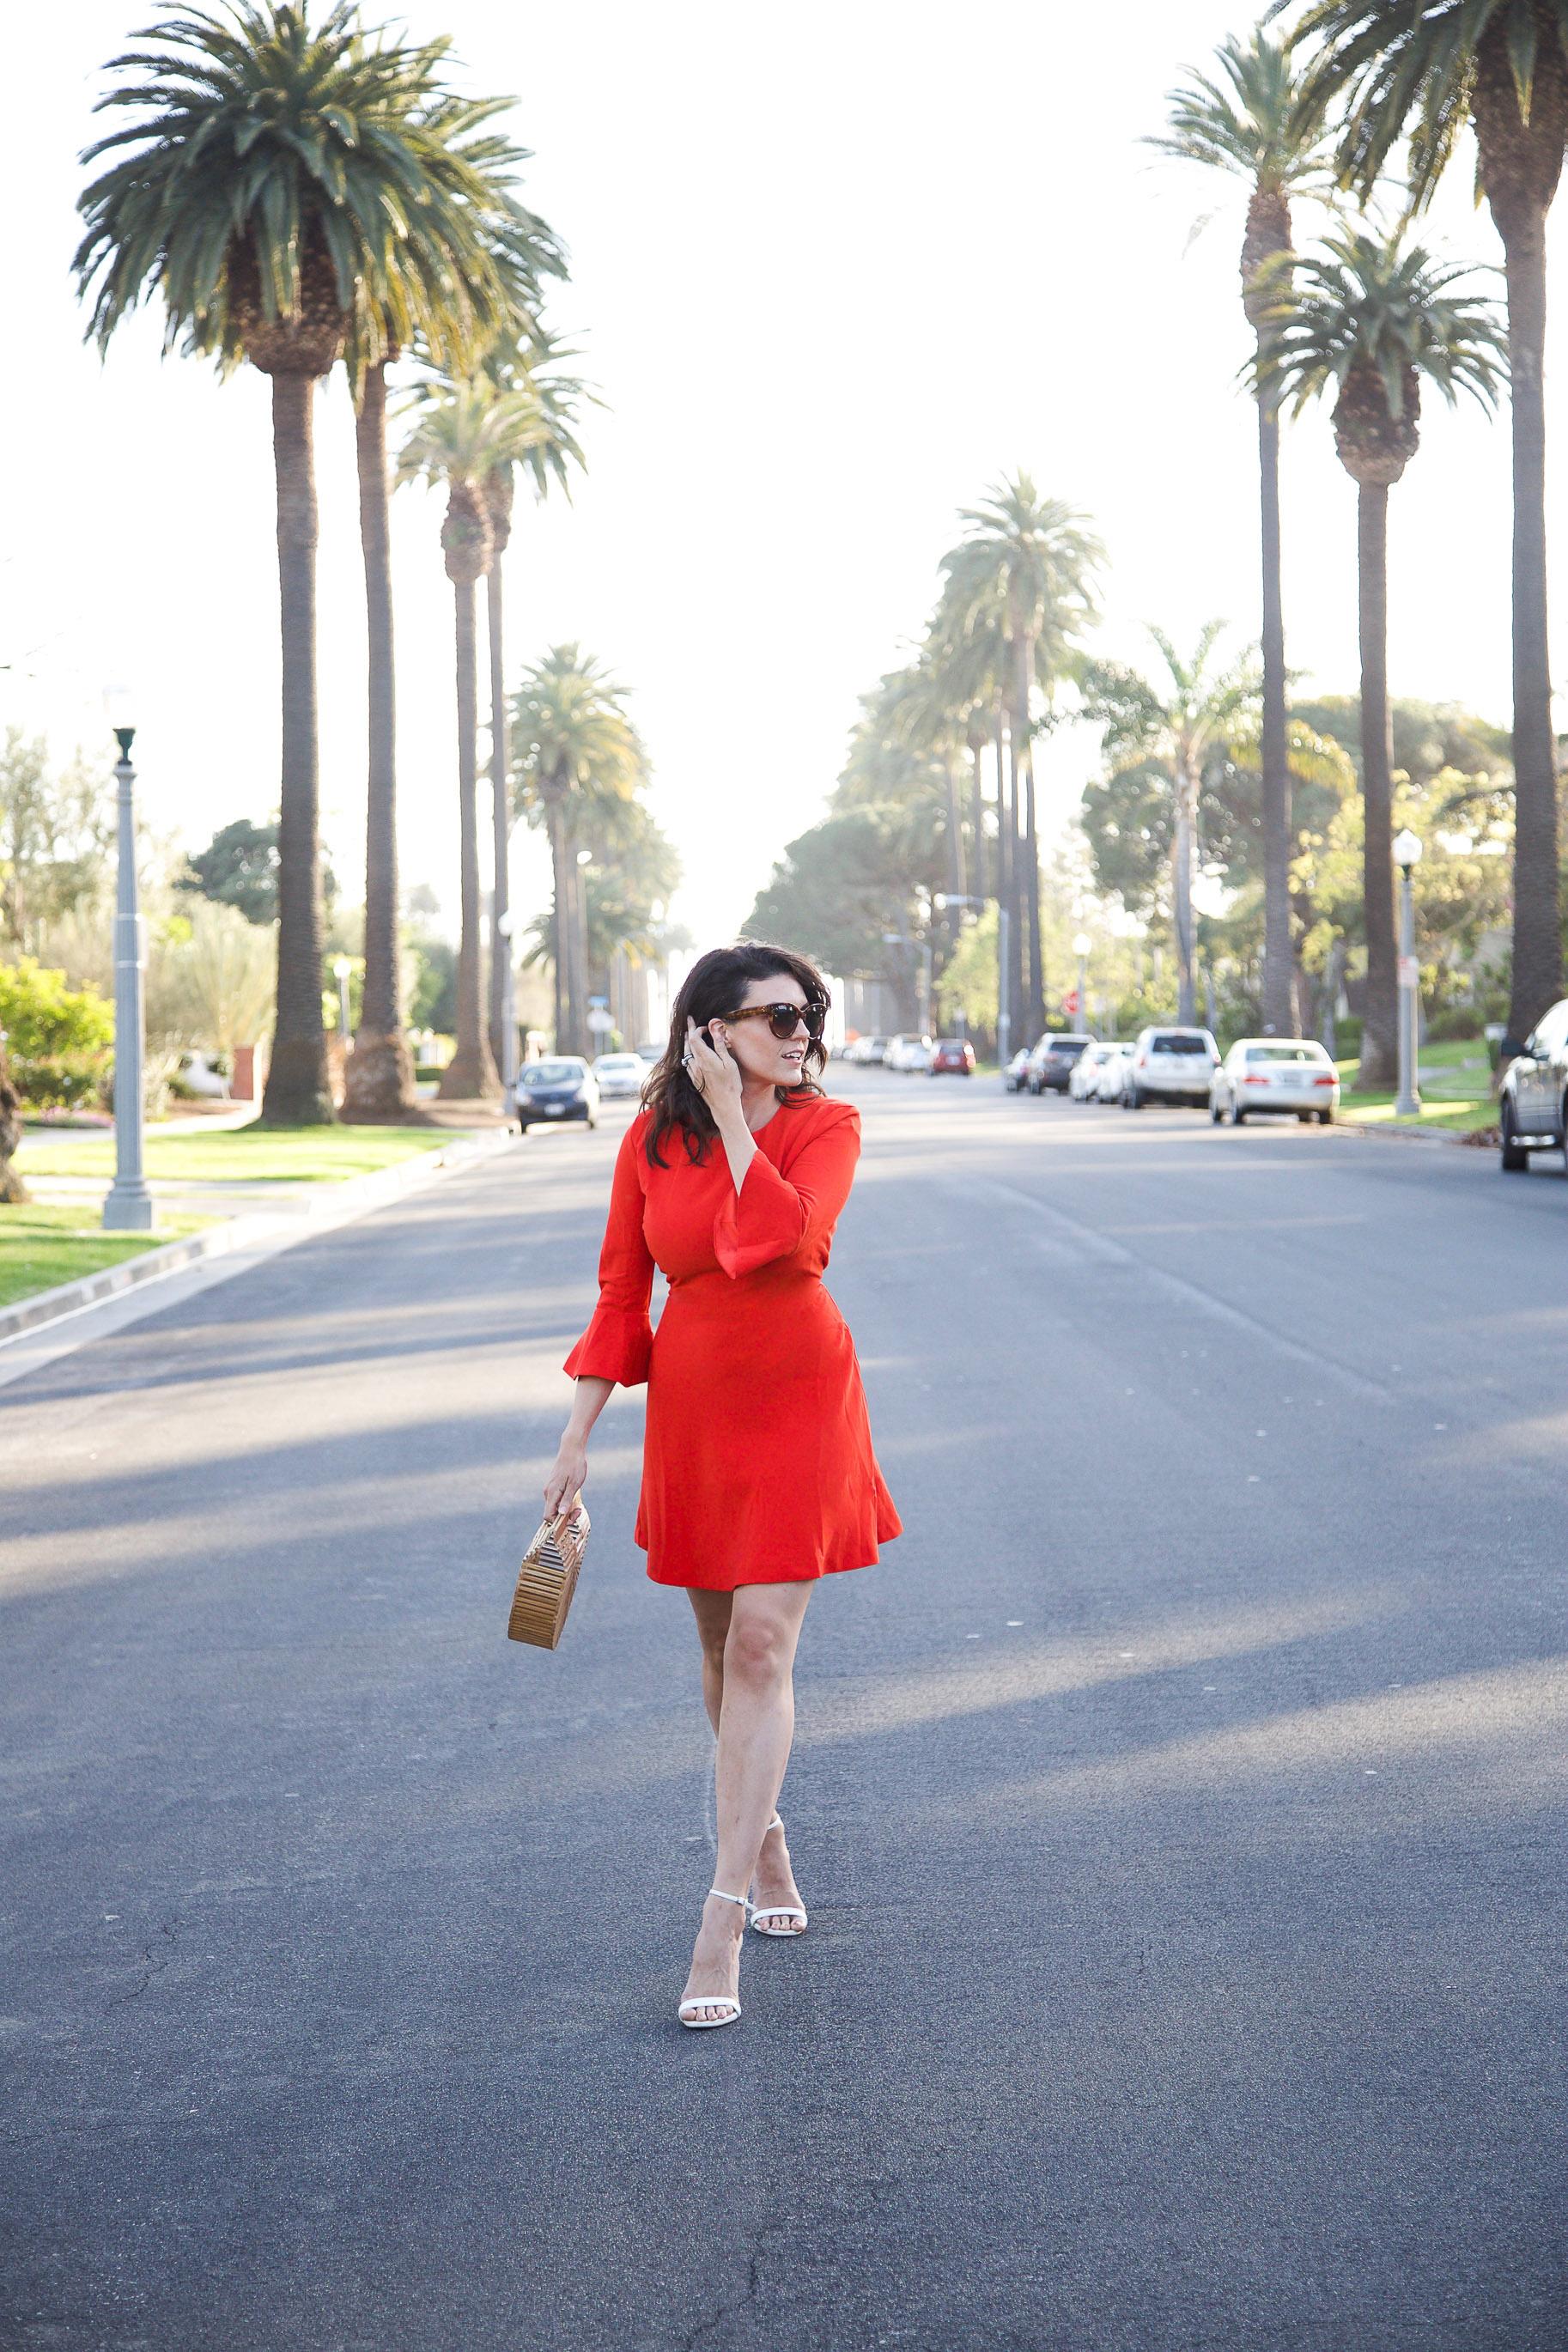 Lucy-Paris-Red-Bell-Sleeved-Dress4.jpg